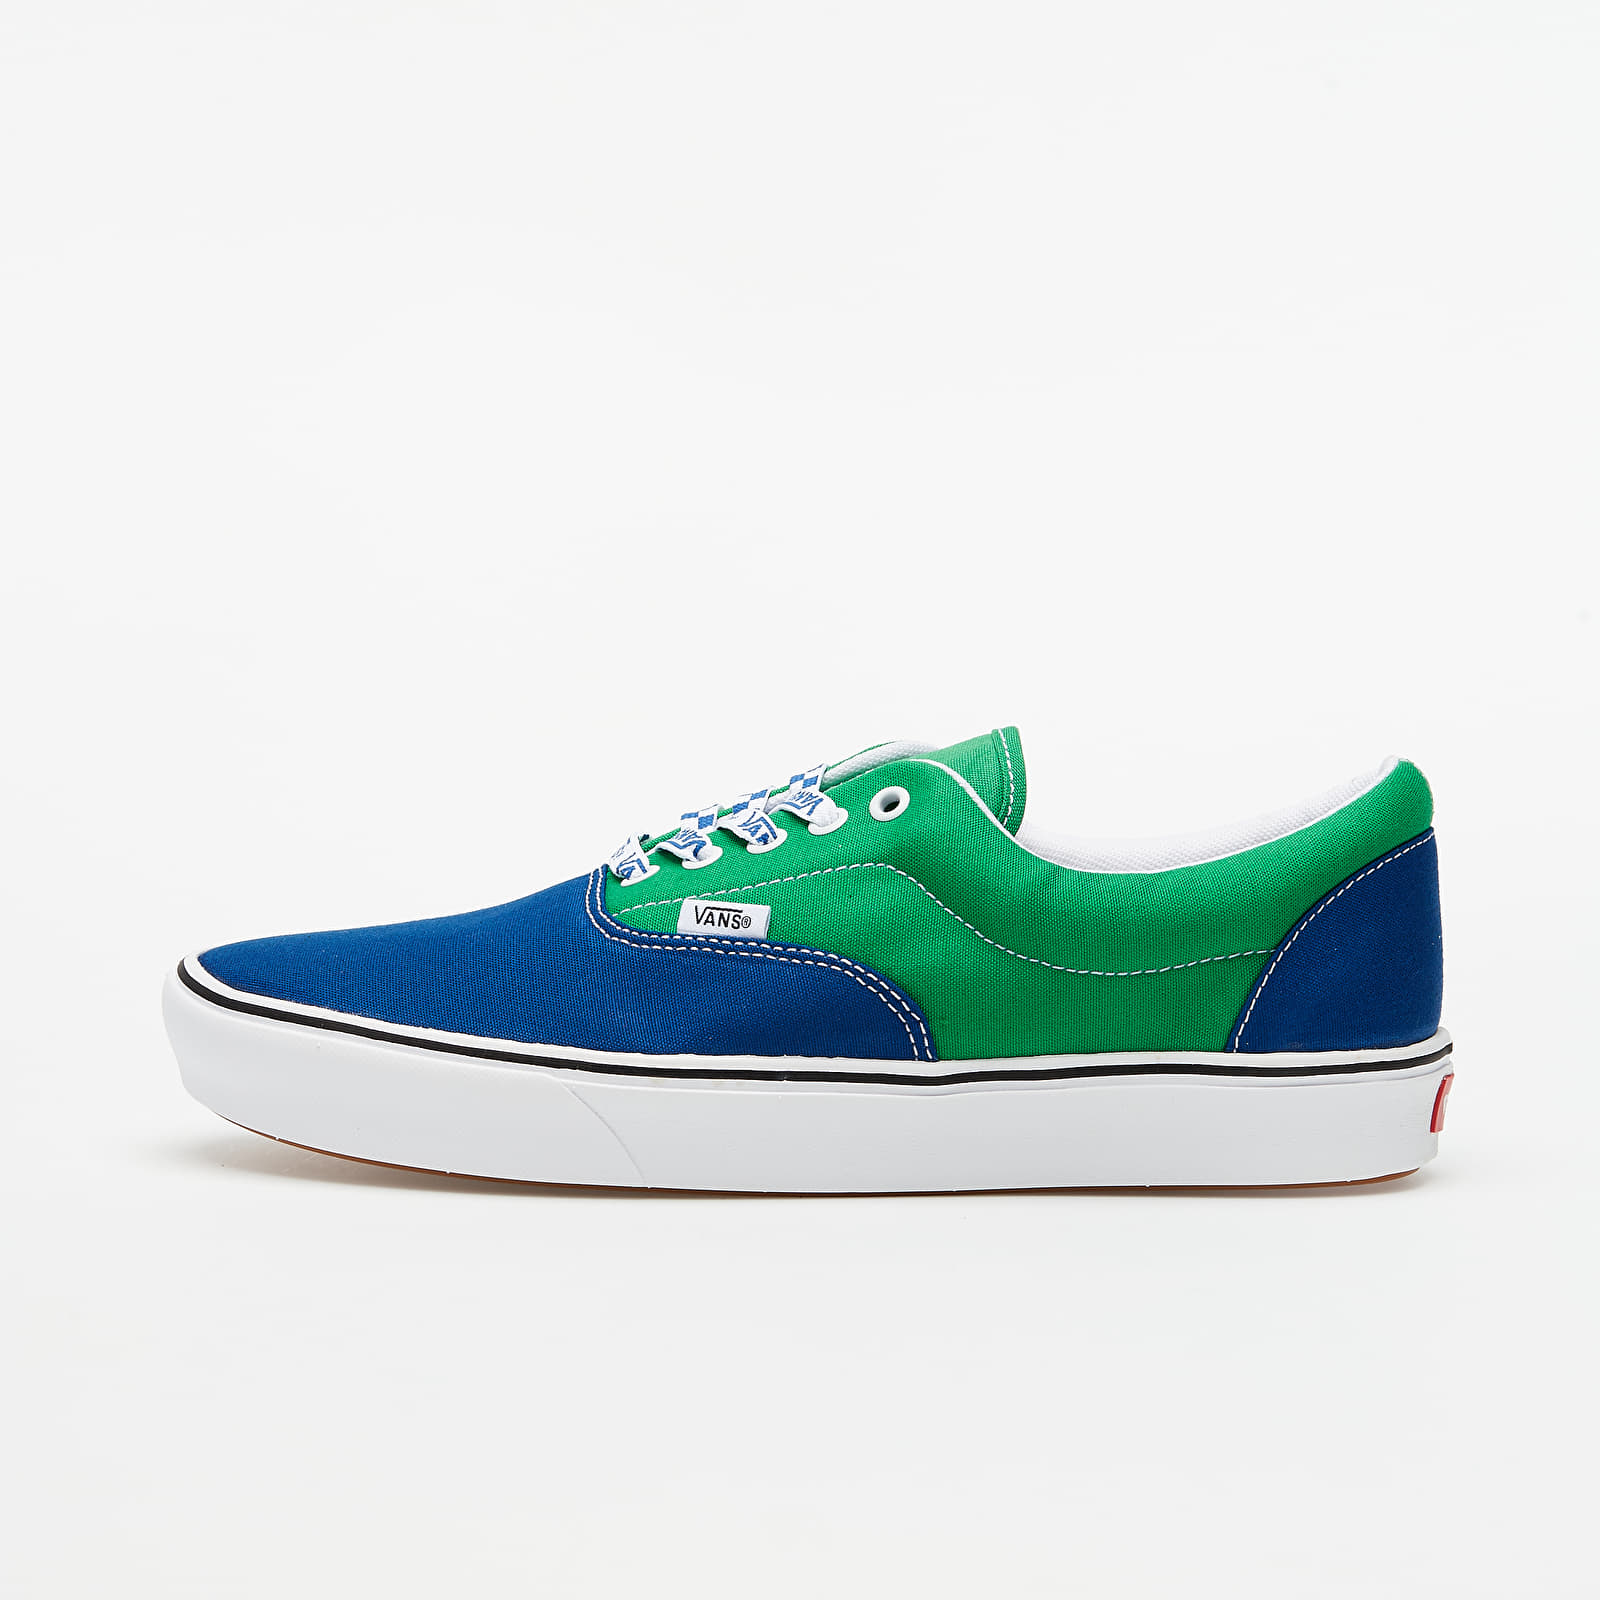 Vans ComfyCush Era (Lace Mix) True White/ Fern Green VN0A3WM9WI11